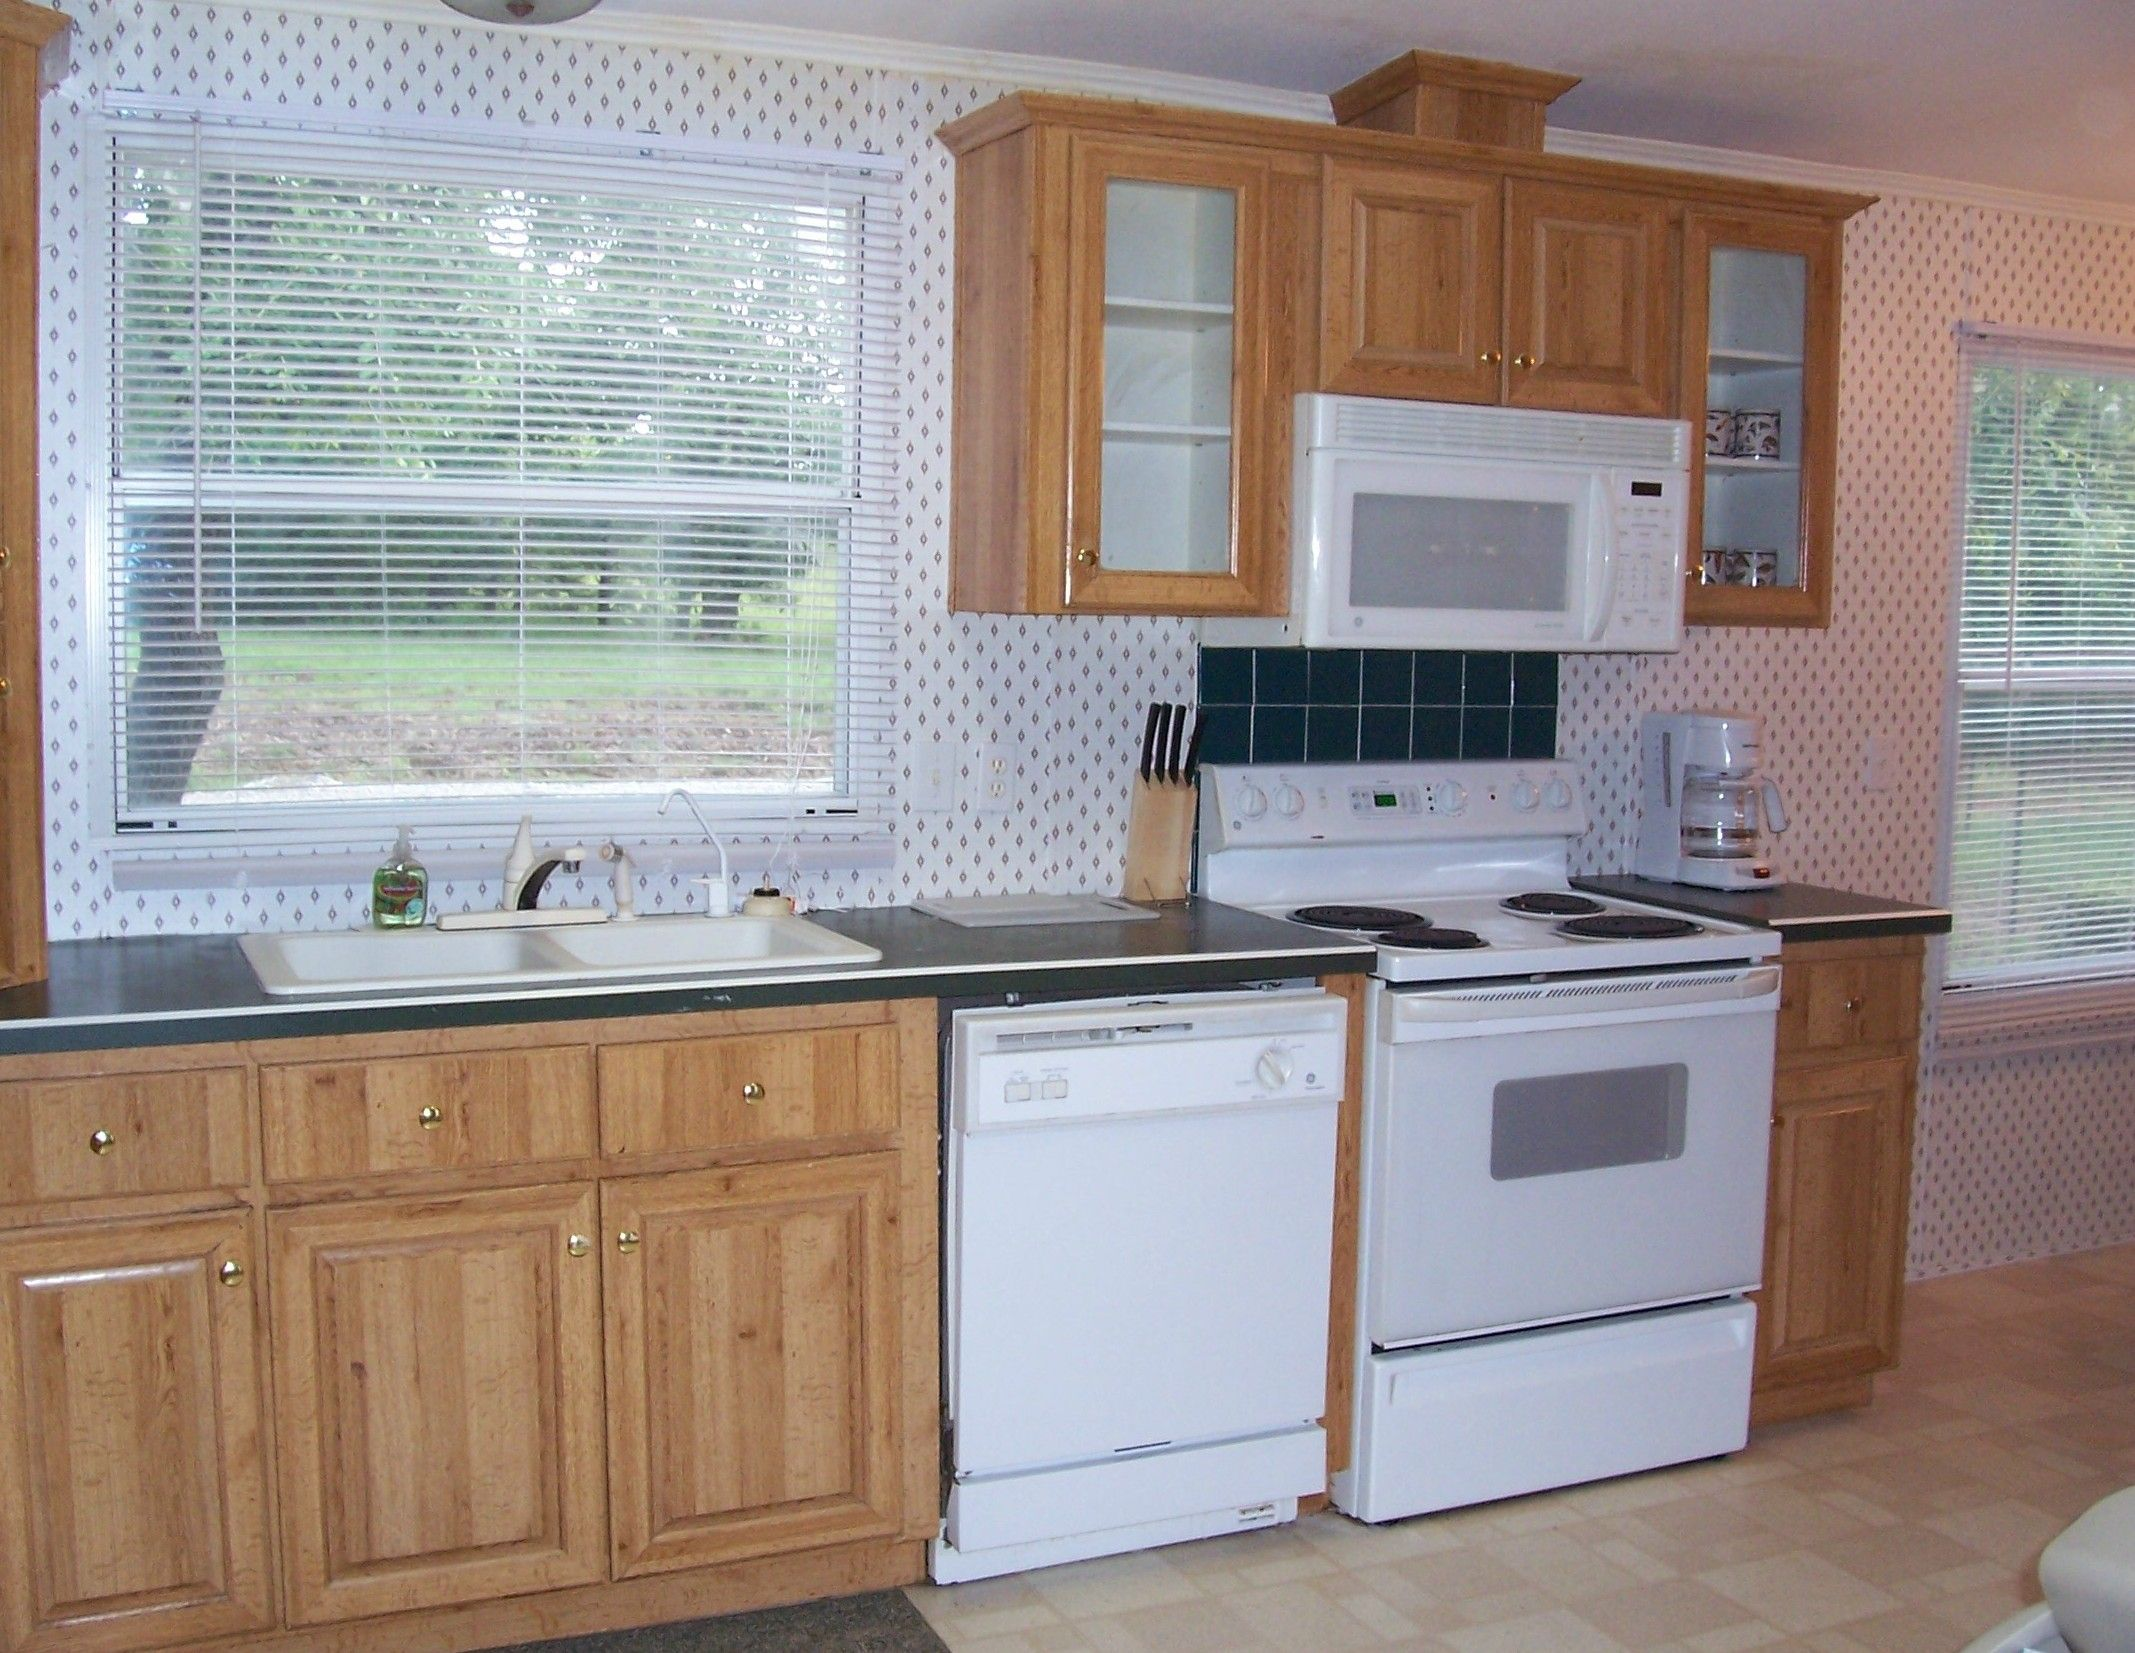 Dishwasher next to stove